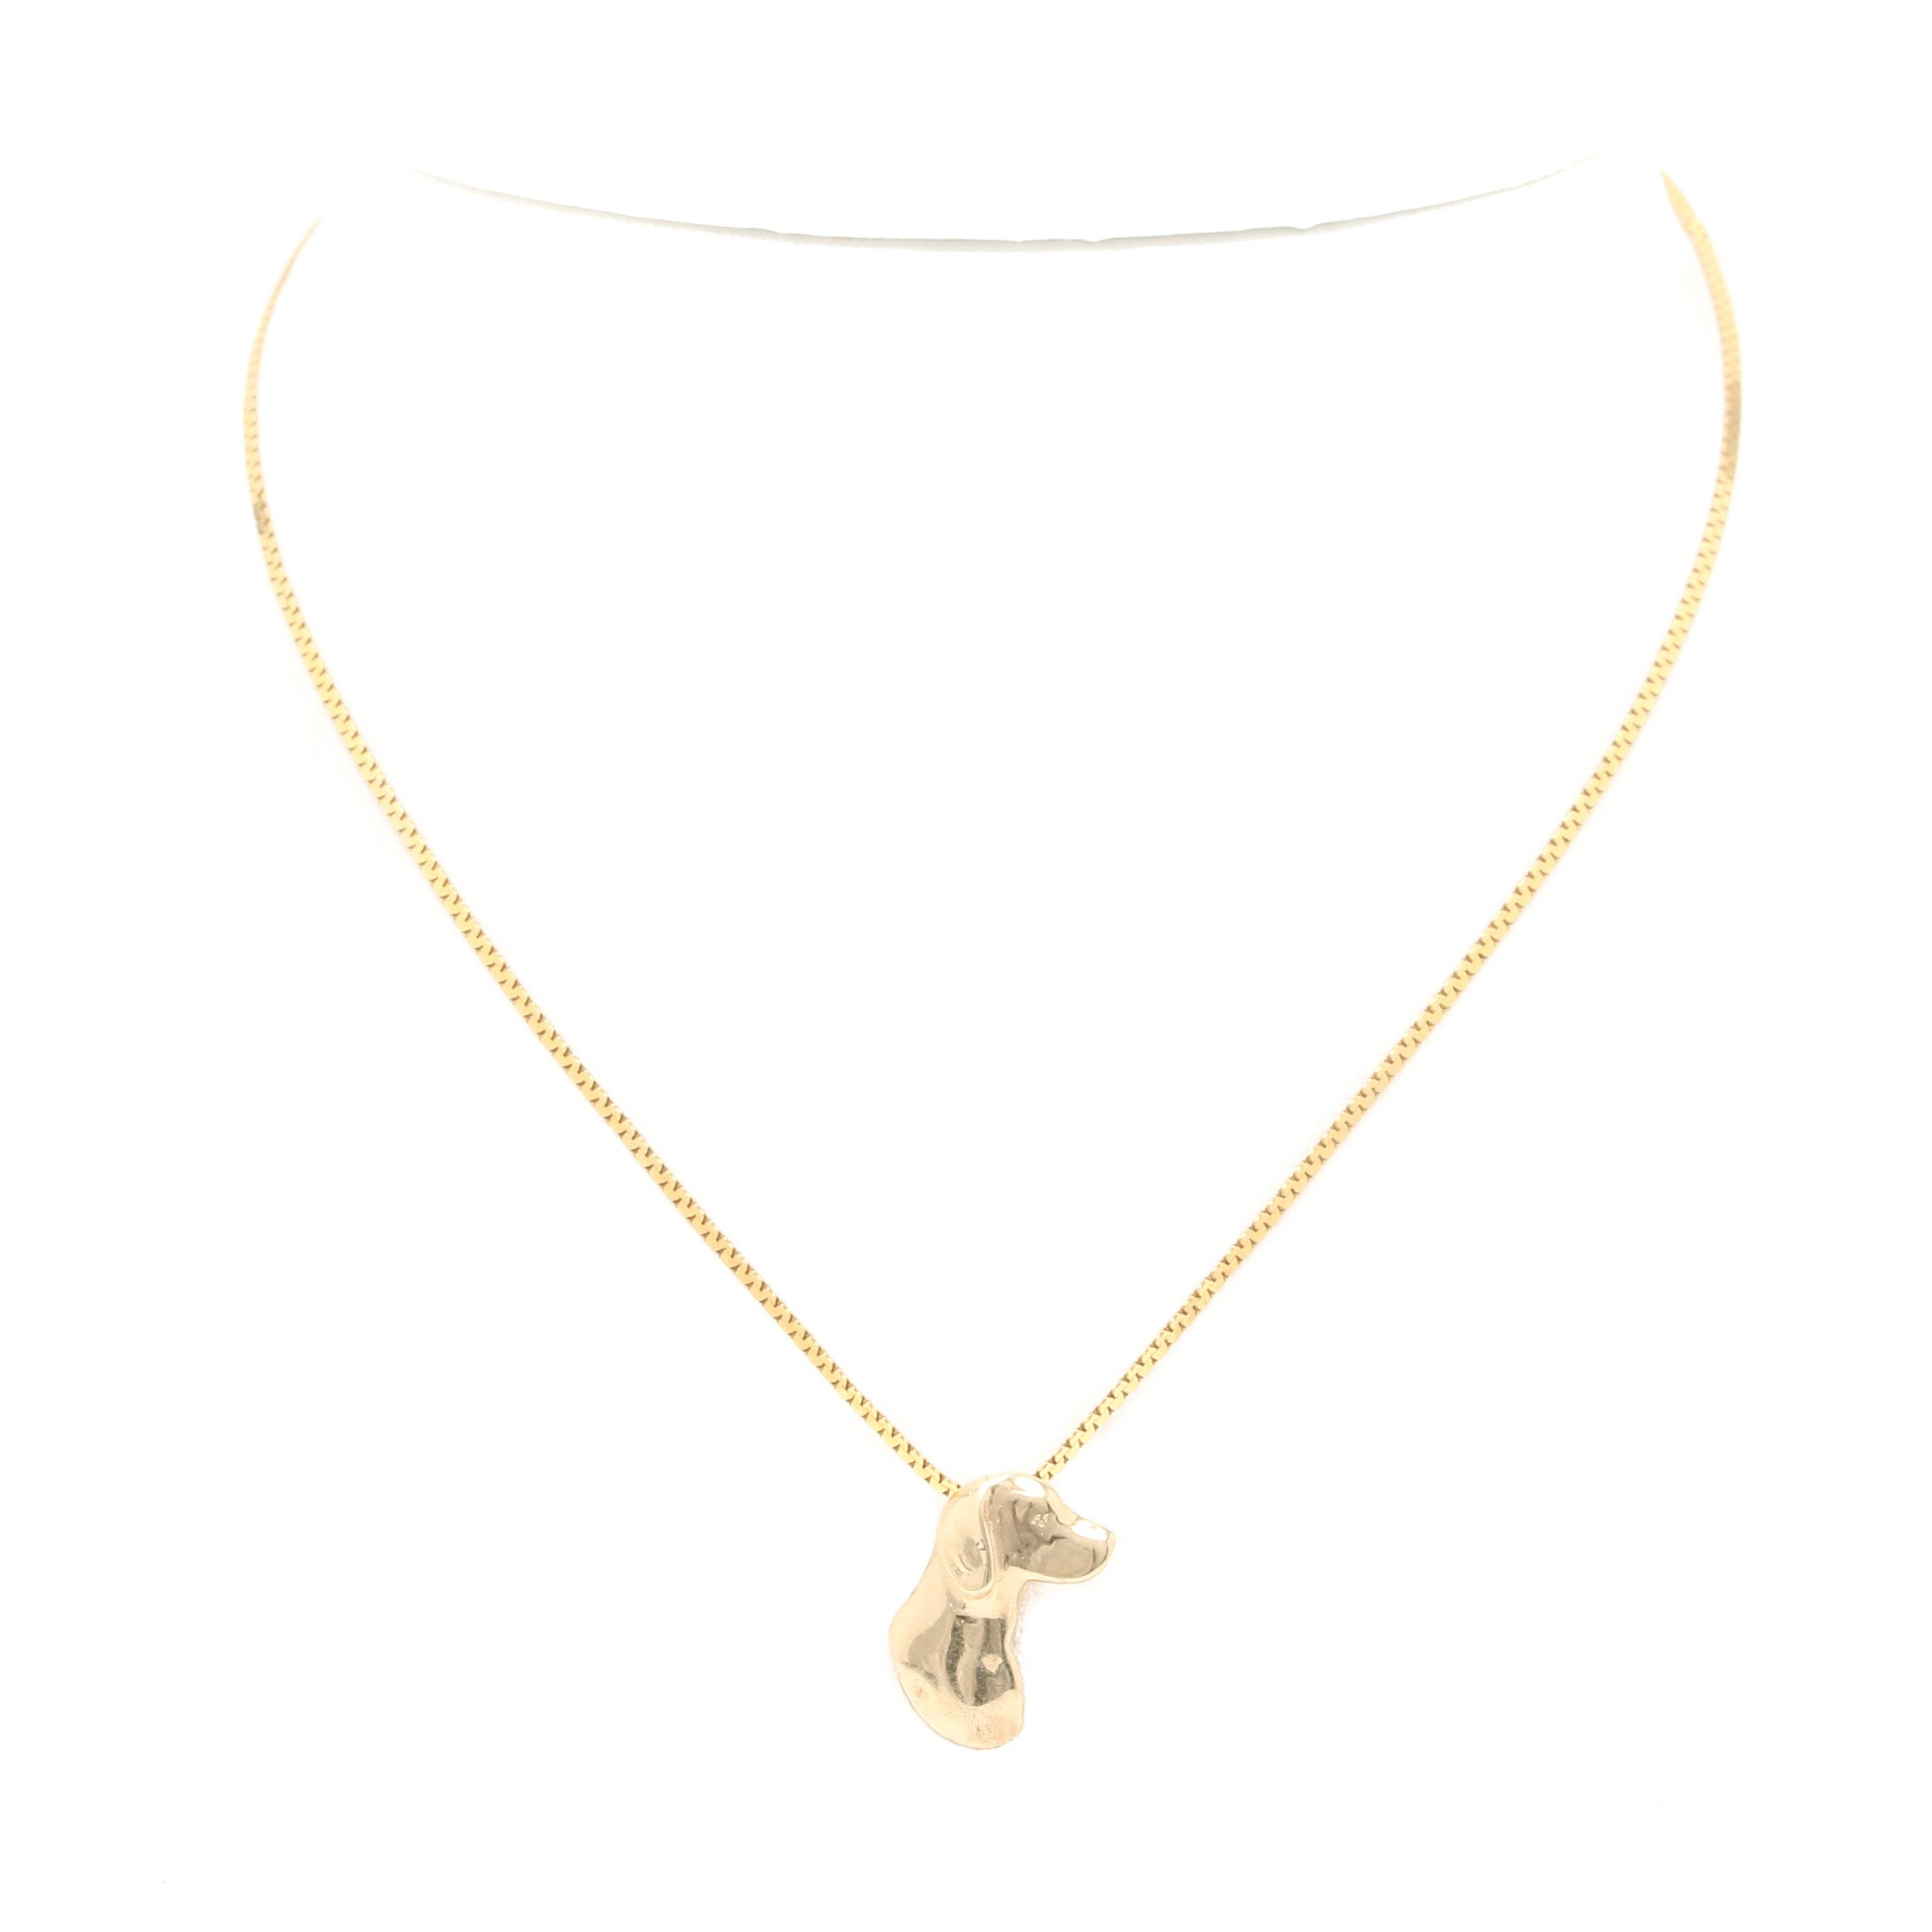 14K Yellow Gold Dog Pendant Necklace